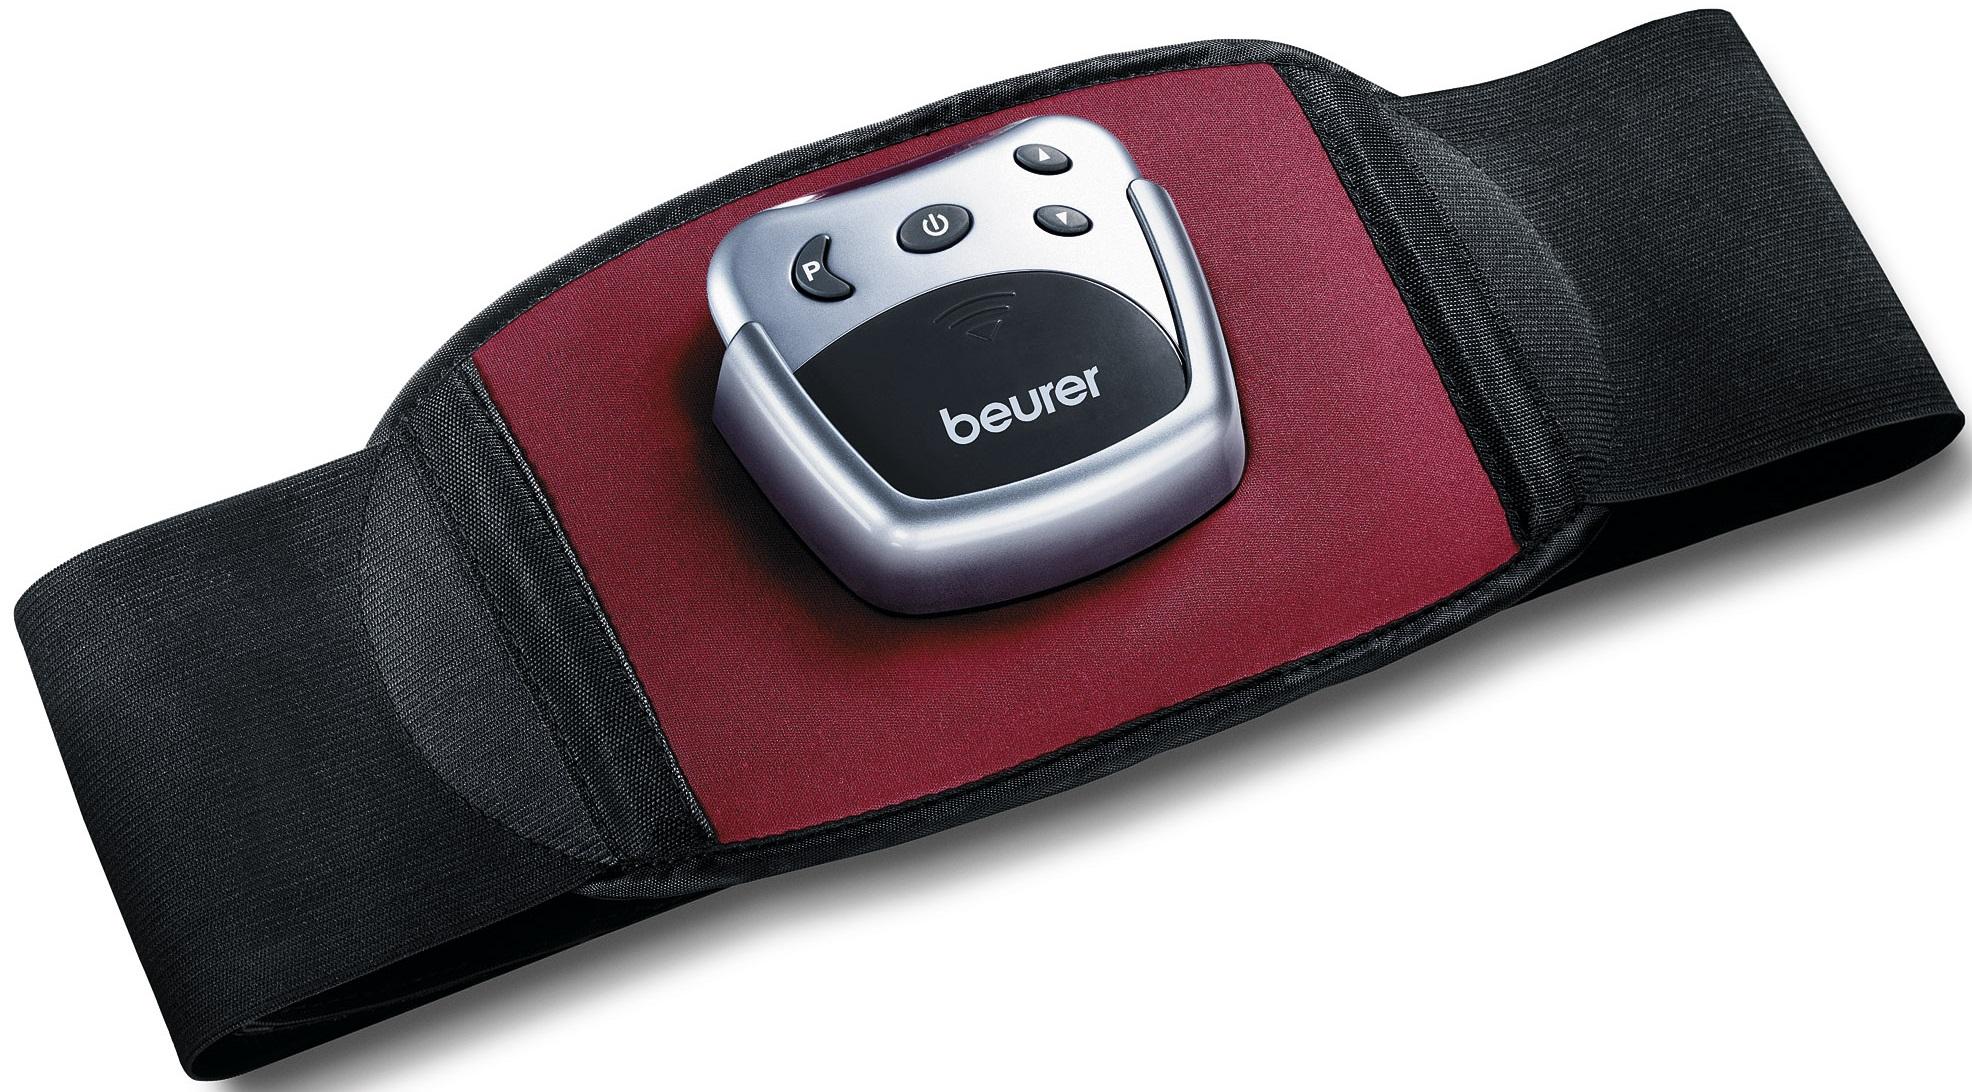 Beurer Тренажер для мышц живота Abdominal Toning Belt